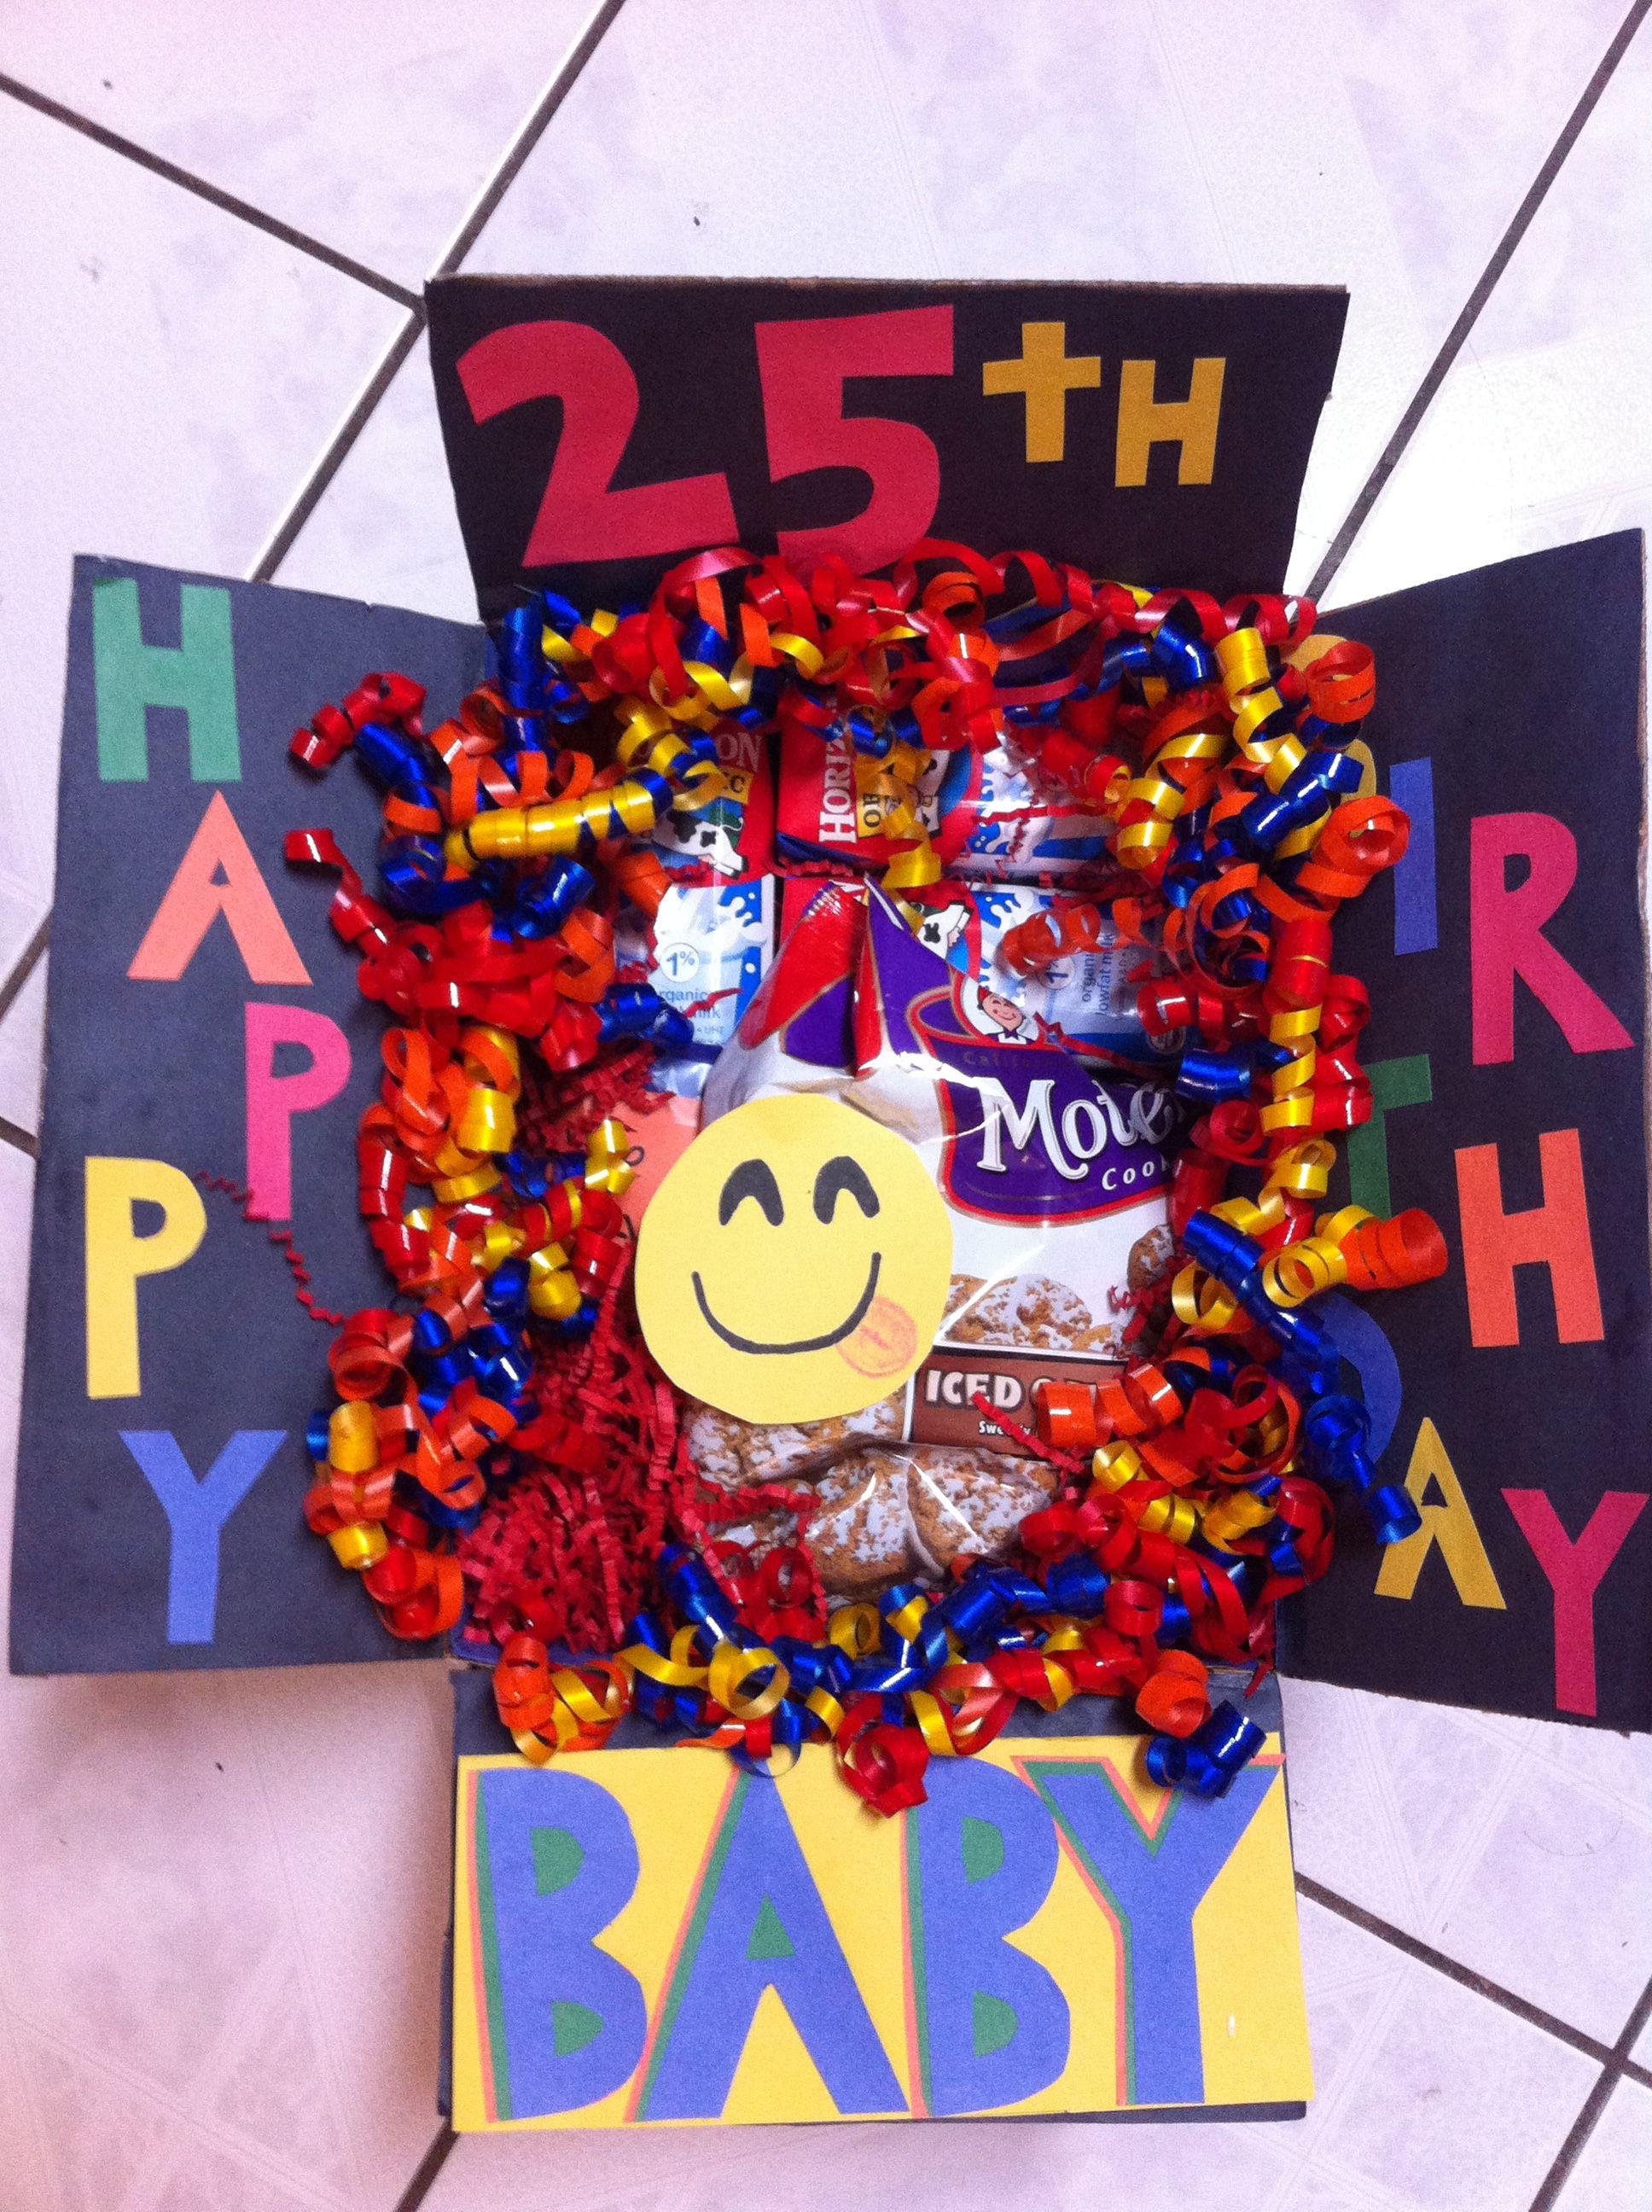 Diy Boyfriend Gift Giftbasket Carepackage Military Marines Army Navy Birthday Package Deployment Longdistancerelationship Long Distance